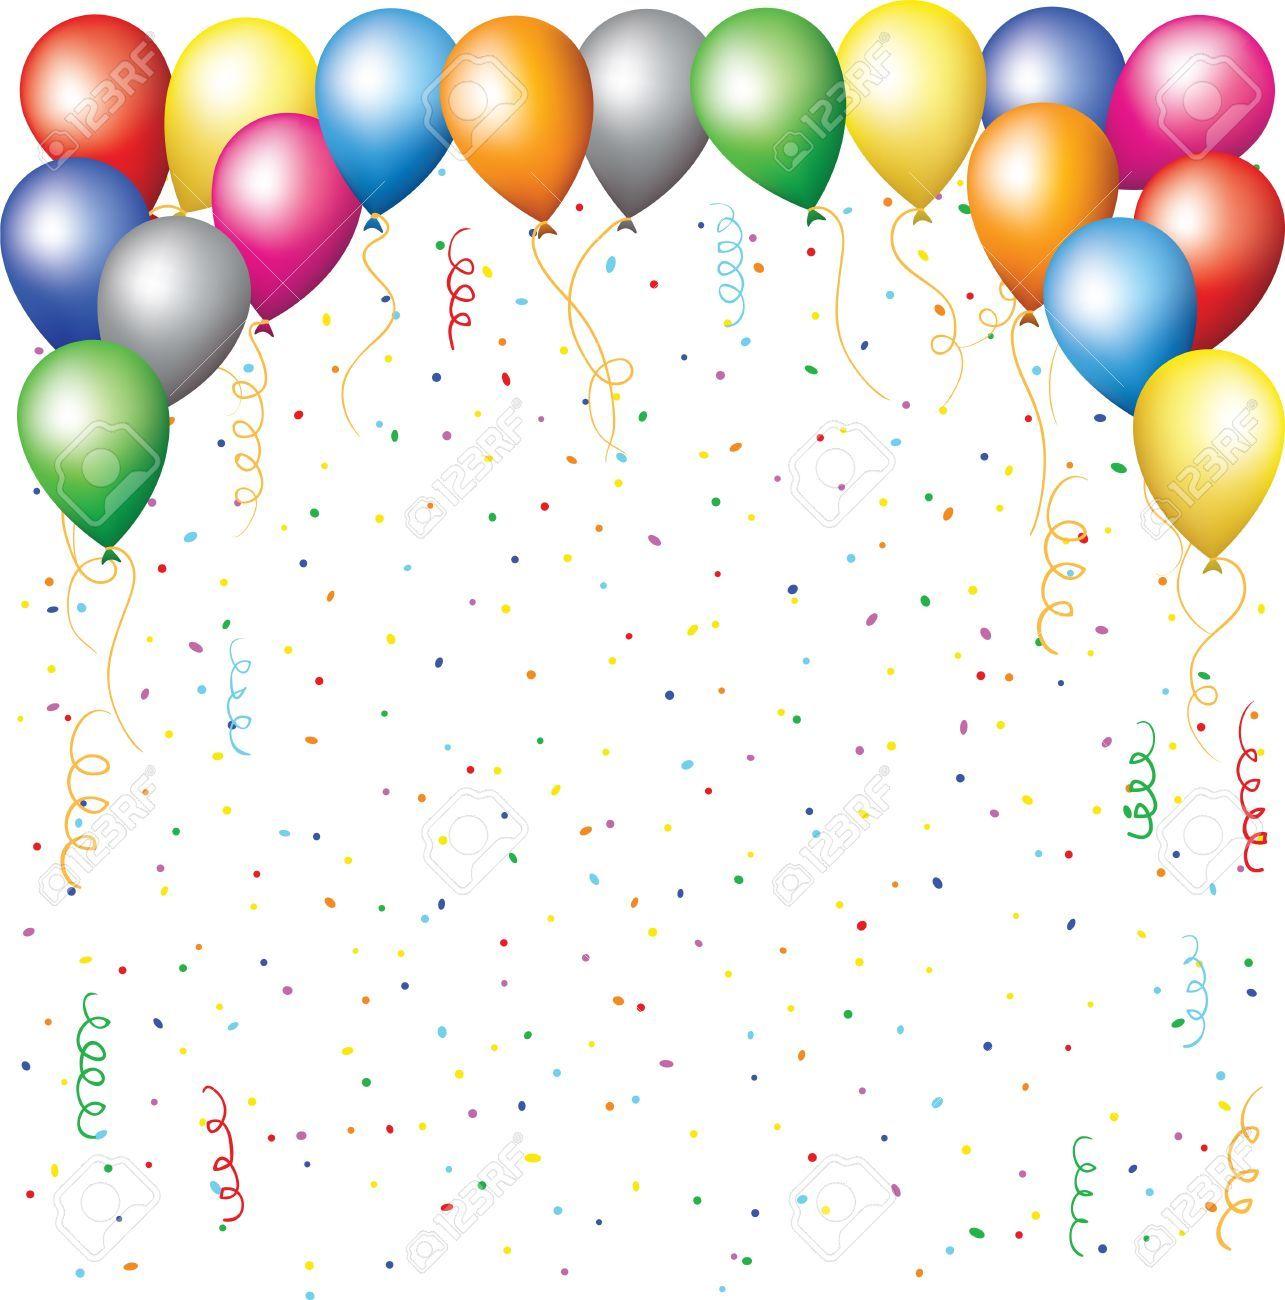 Foto de archivo fondo feliz cumplea os con globos for Smow gutschein